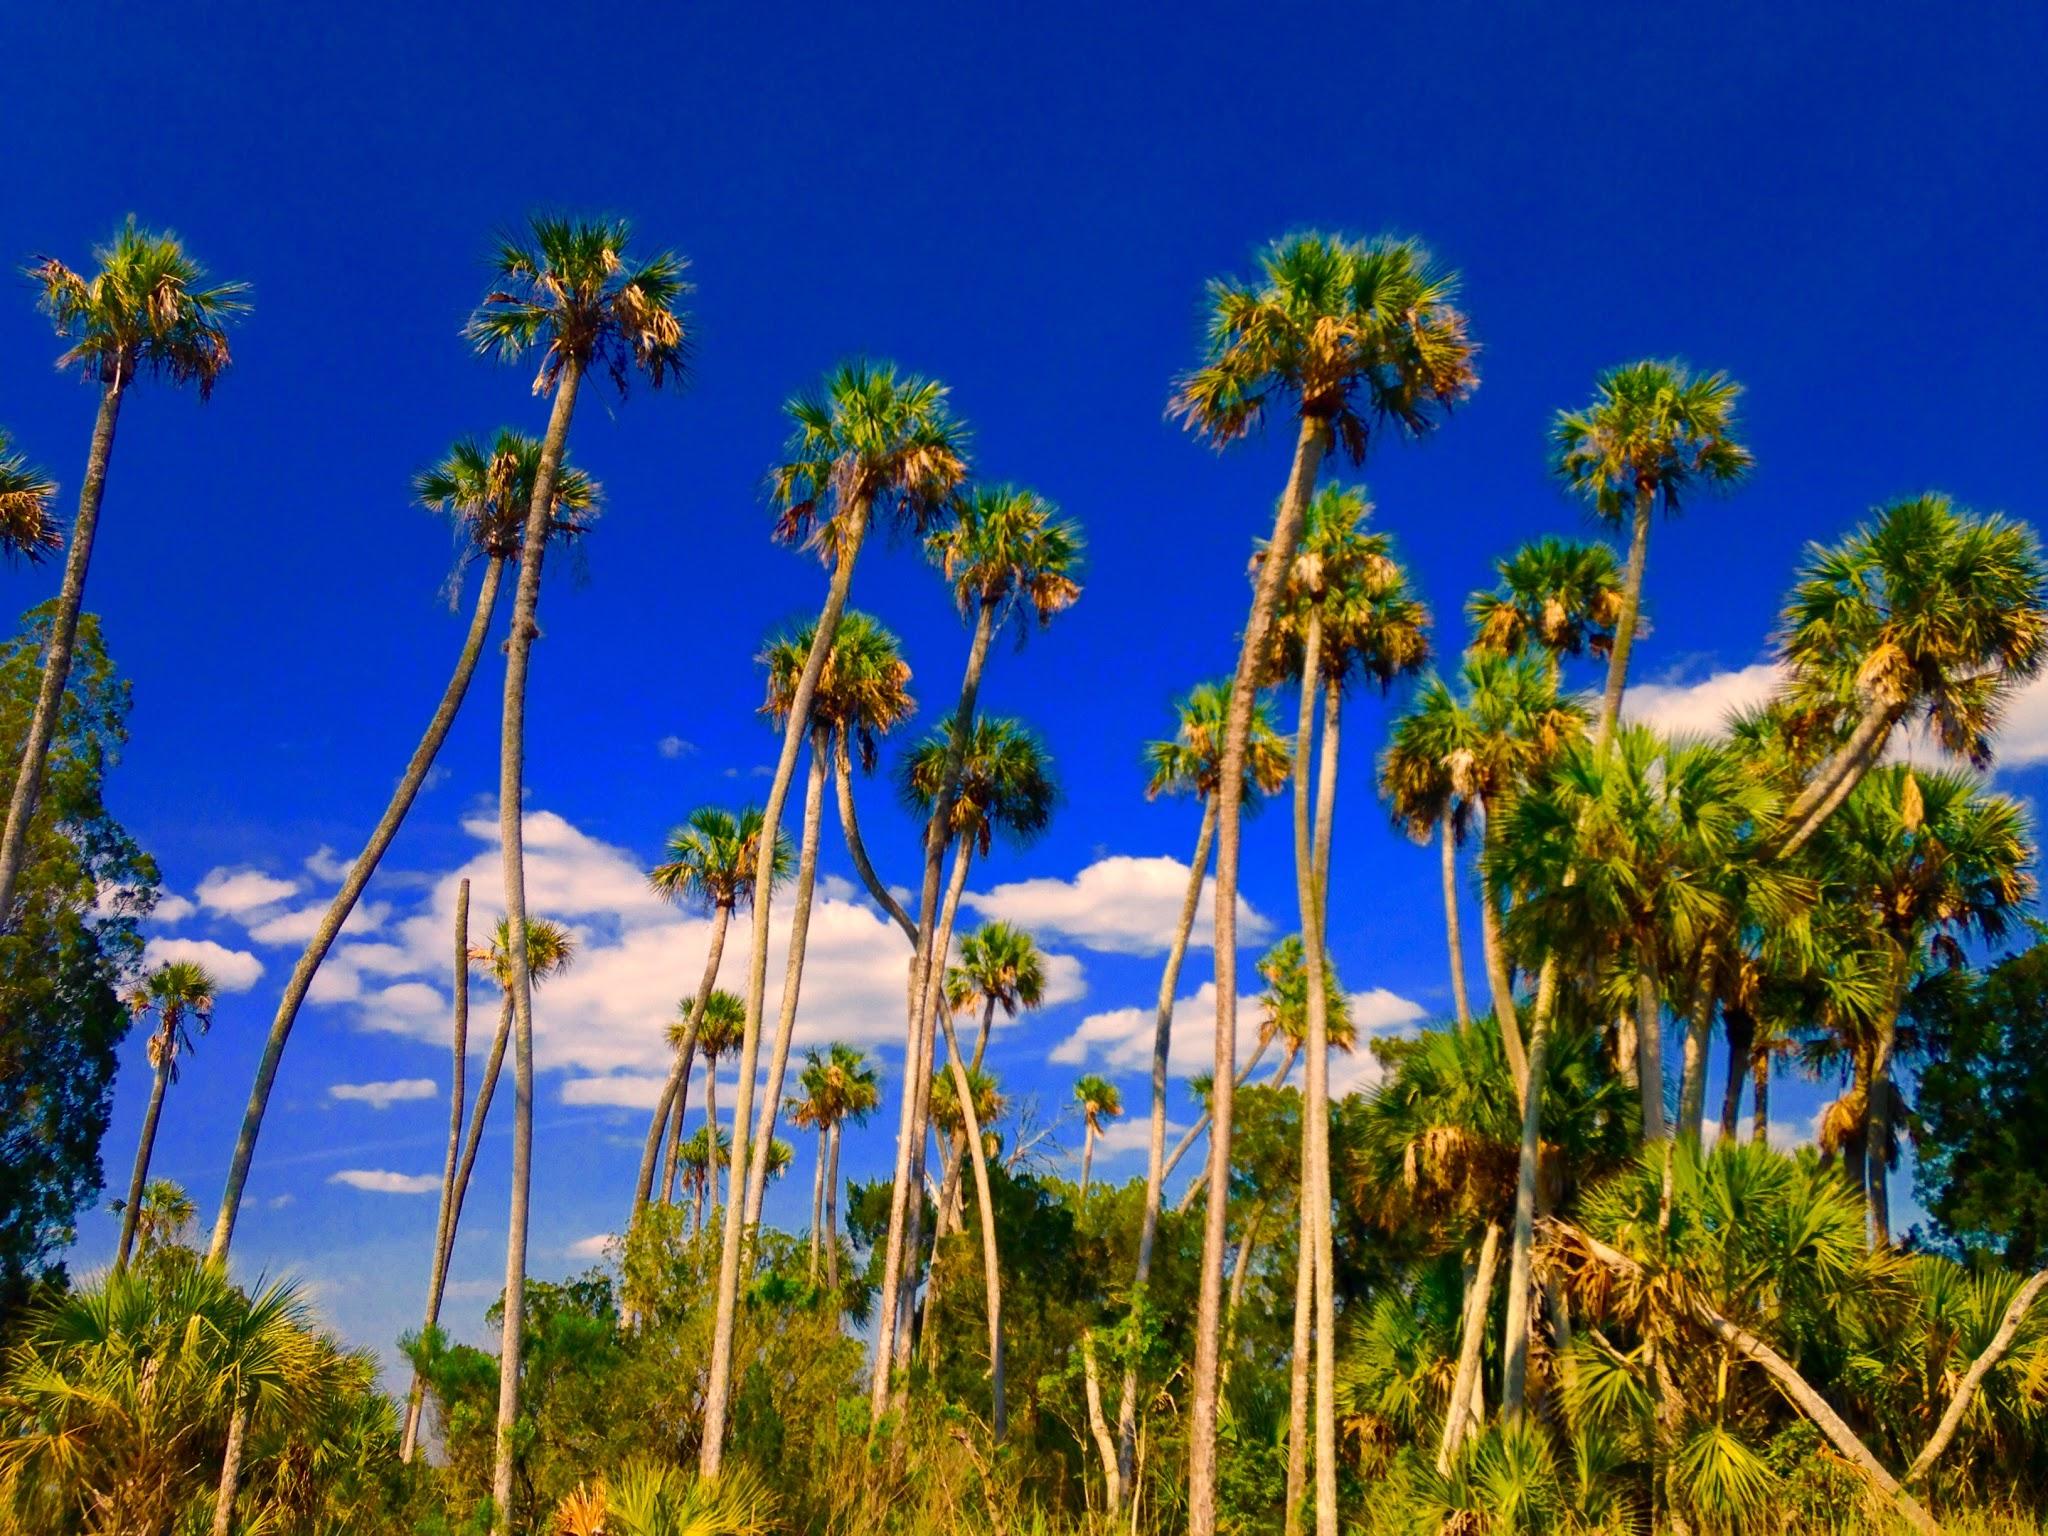 entracing palm tree type house plant. 579b69565d412 100palms jpg e2c7d3de3cad4 Florida vs California Palm trees  DISCUSSING PALM TREES WORLDWIDE